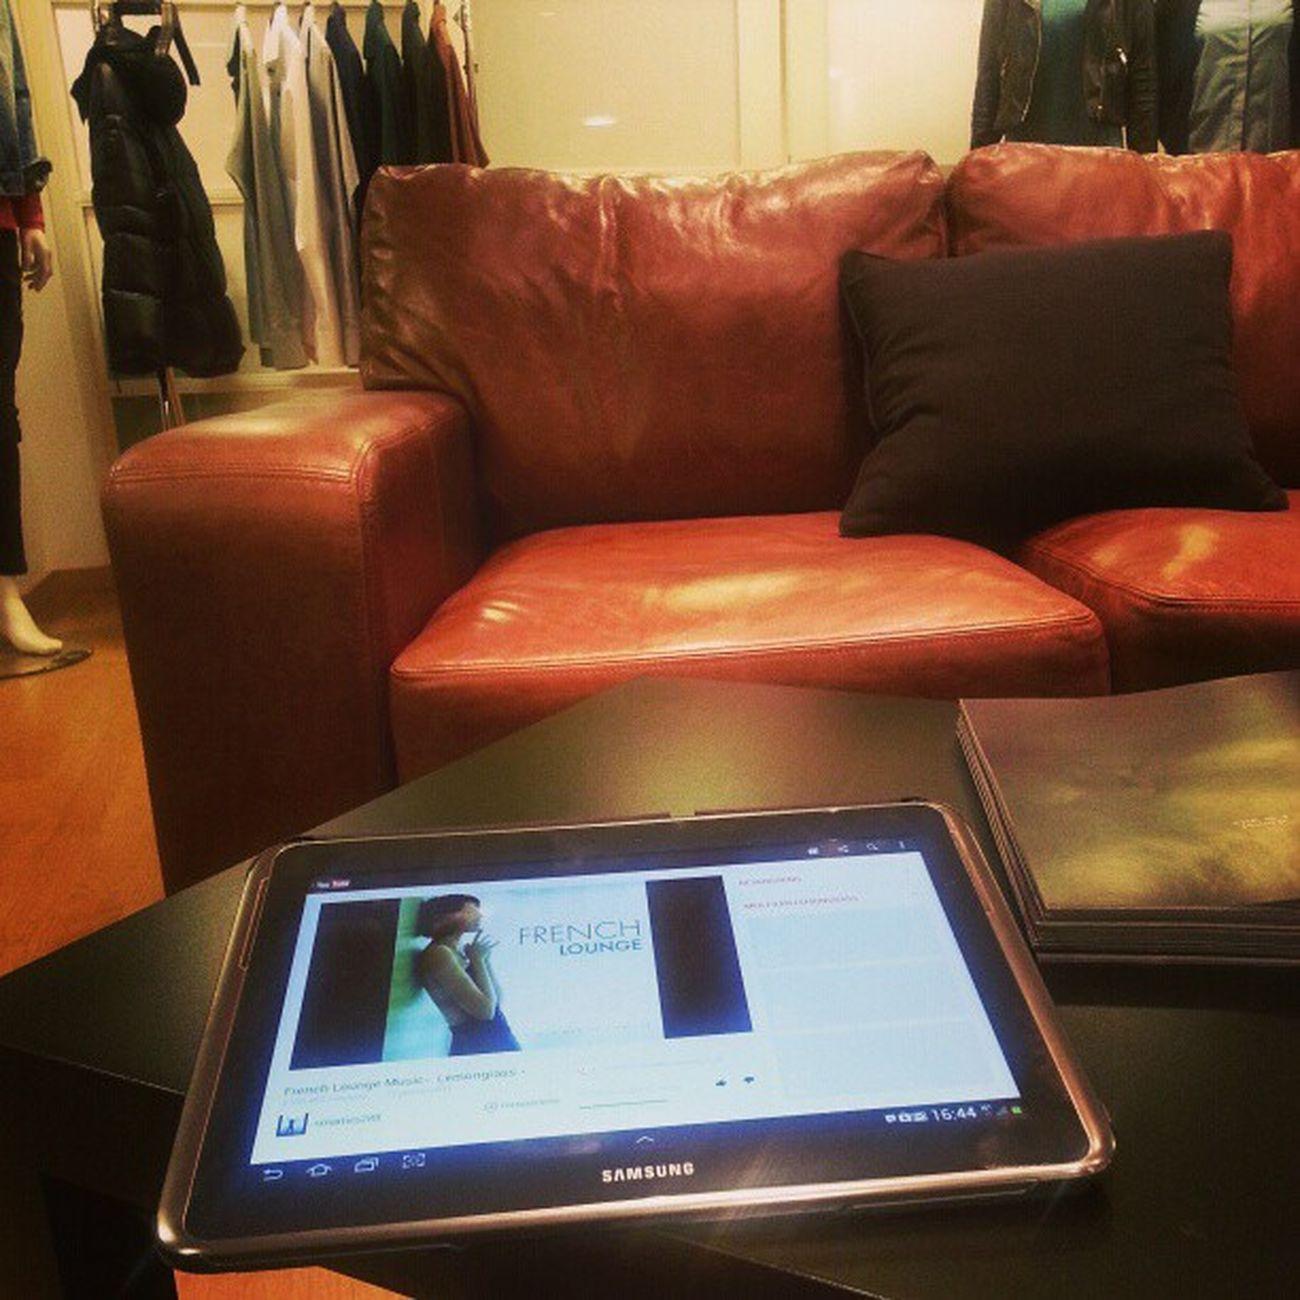 Dbrand Fashion Blogg Mode Design Jeans Store Love Samsung Shoes Showrom Denim Music jackor